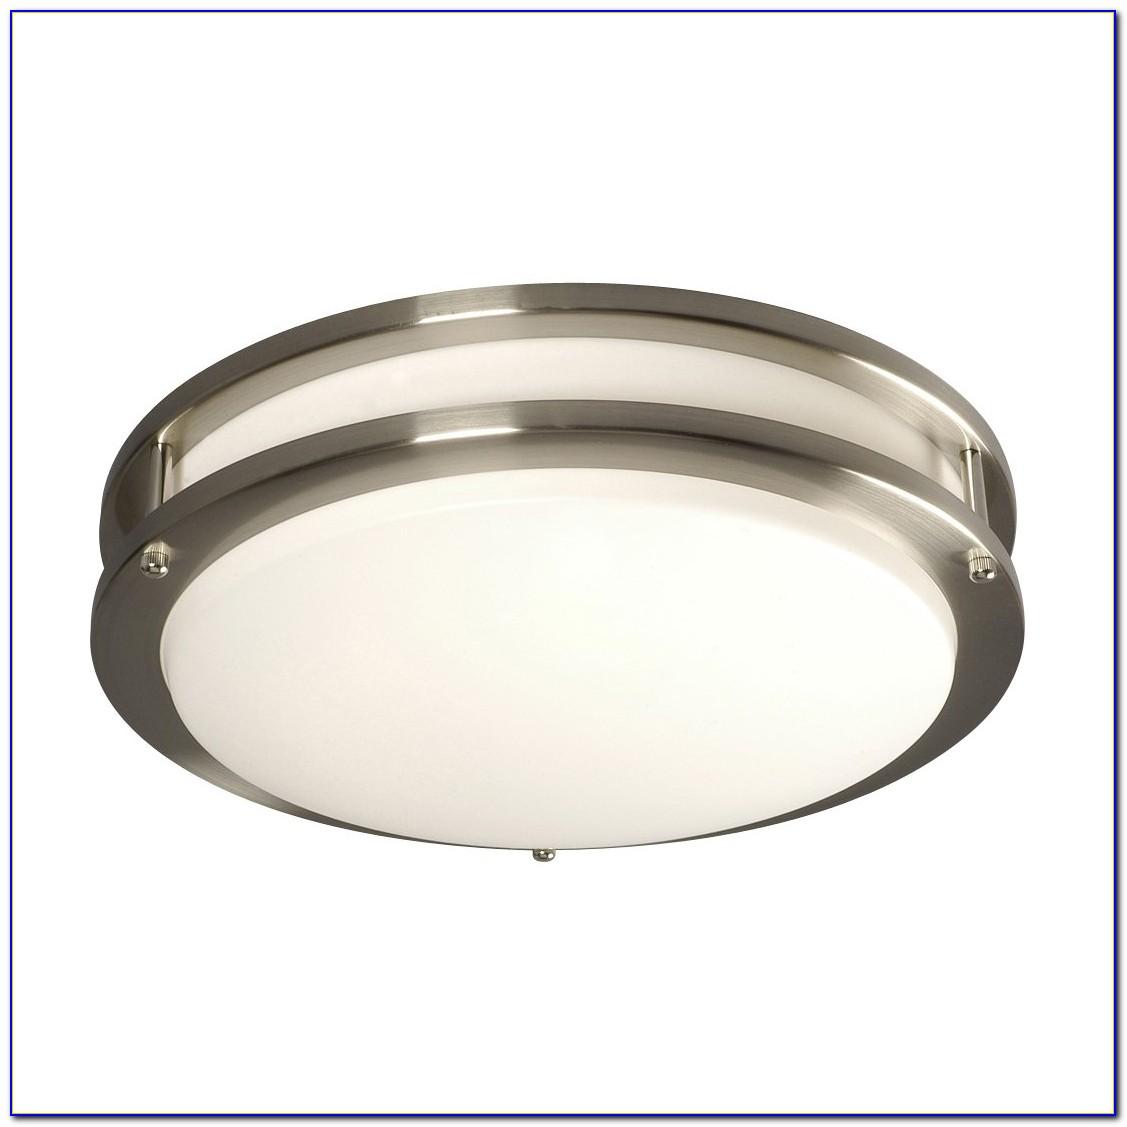 Brushed Nickel Ceiling Light Plate